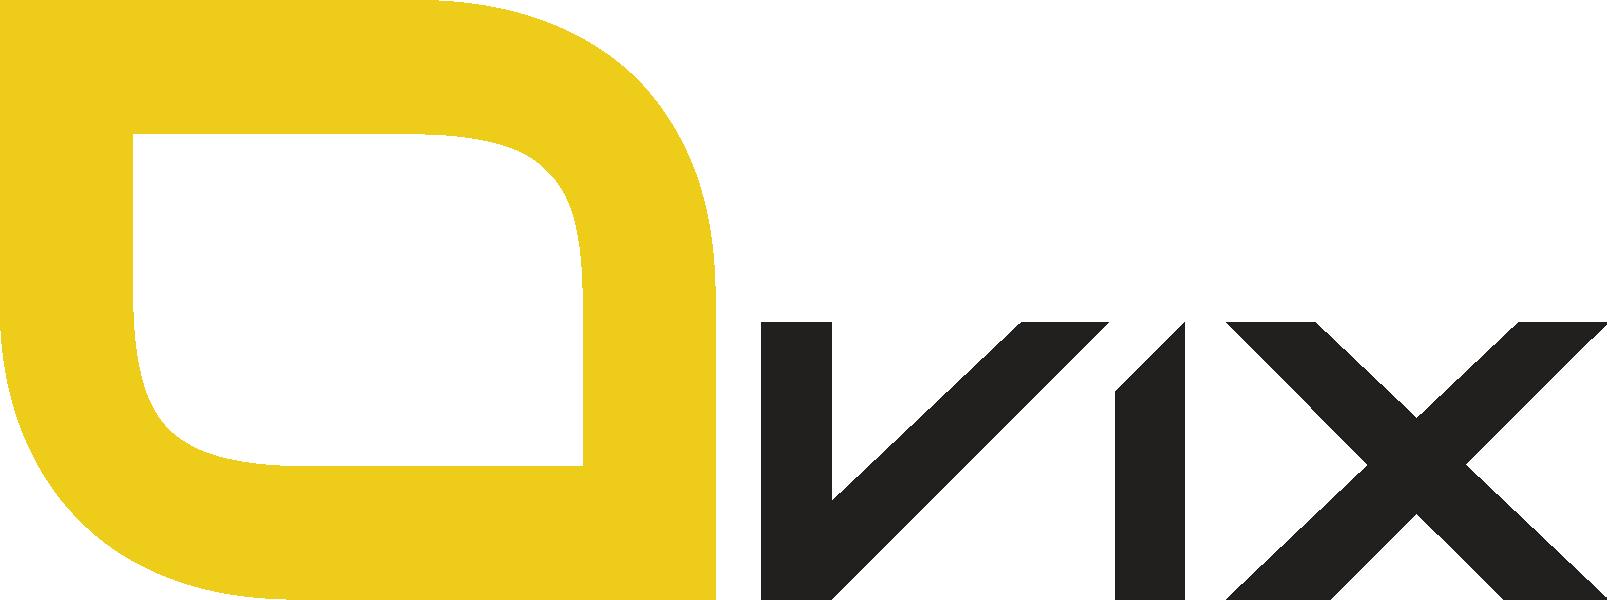 Ovix - Servicii complete in instalatii